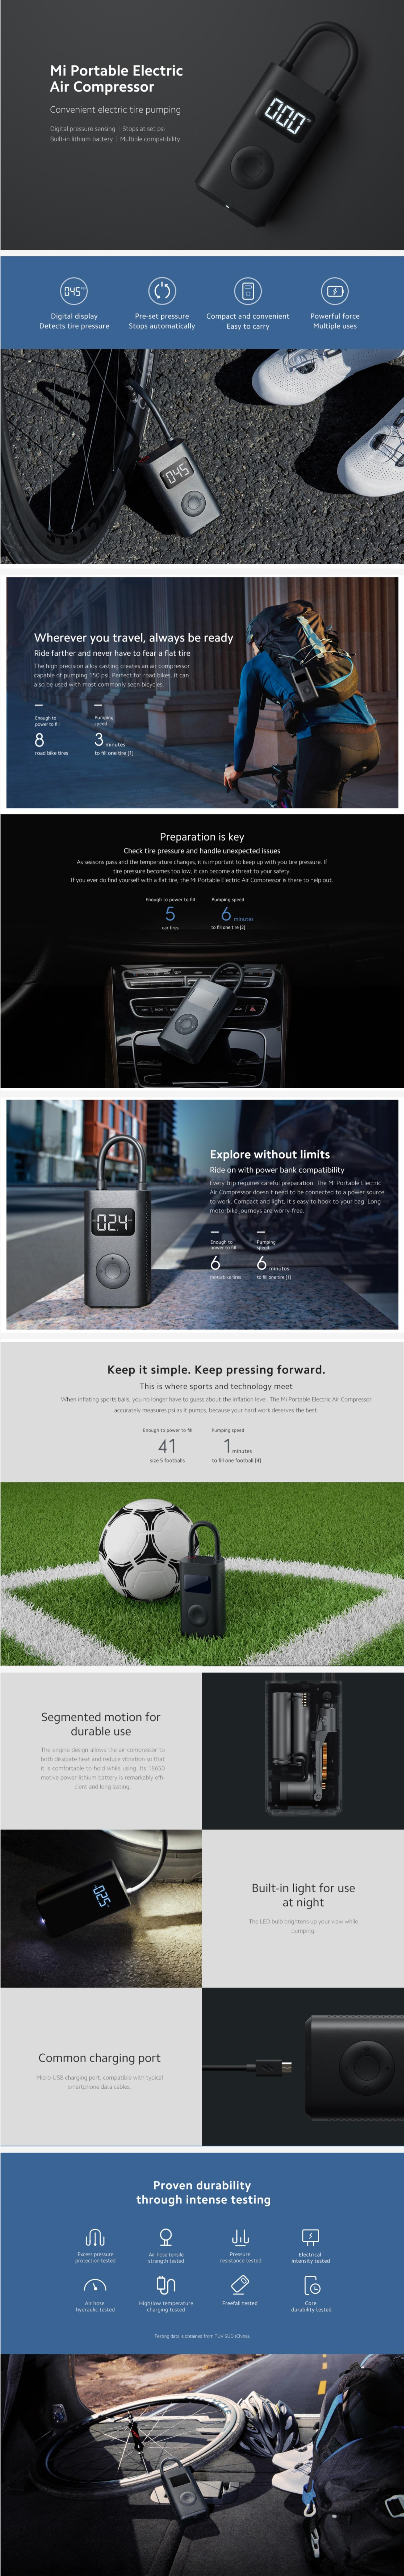 Prenosni Baterijski Kompresor (Xiaomi Mi Portable Air Pump)